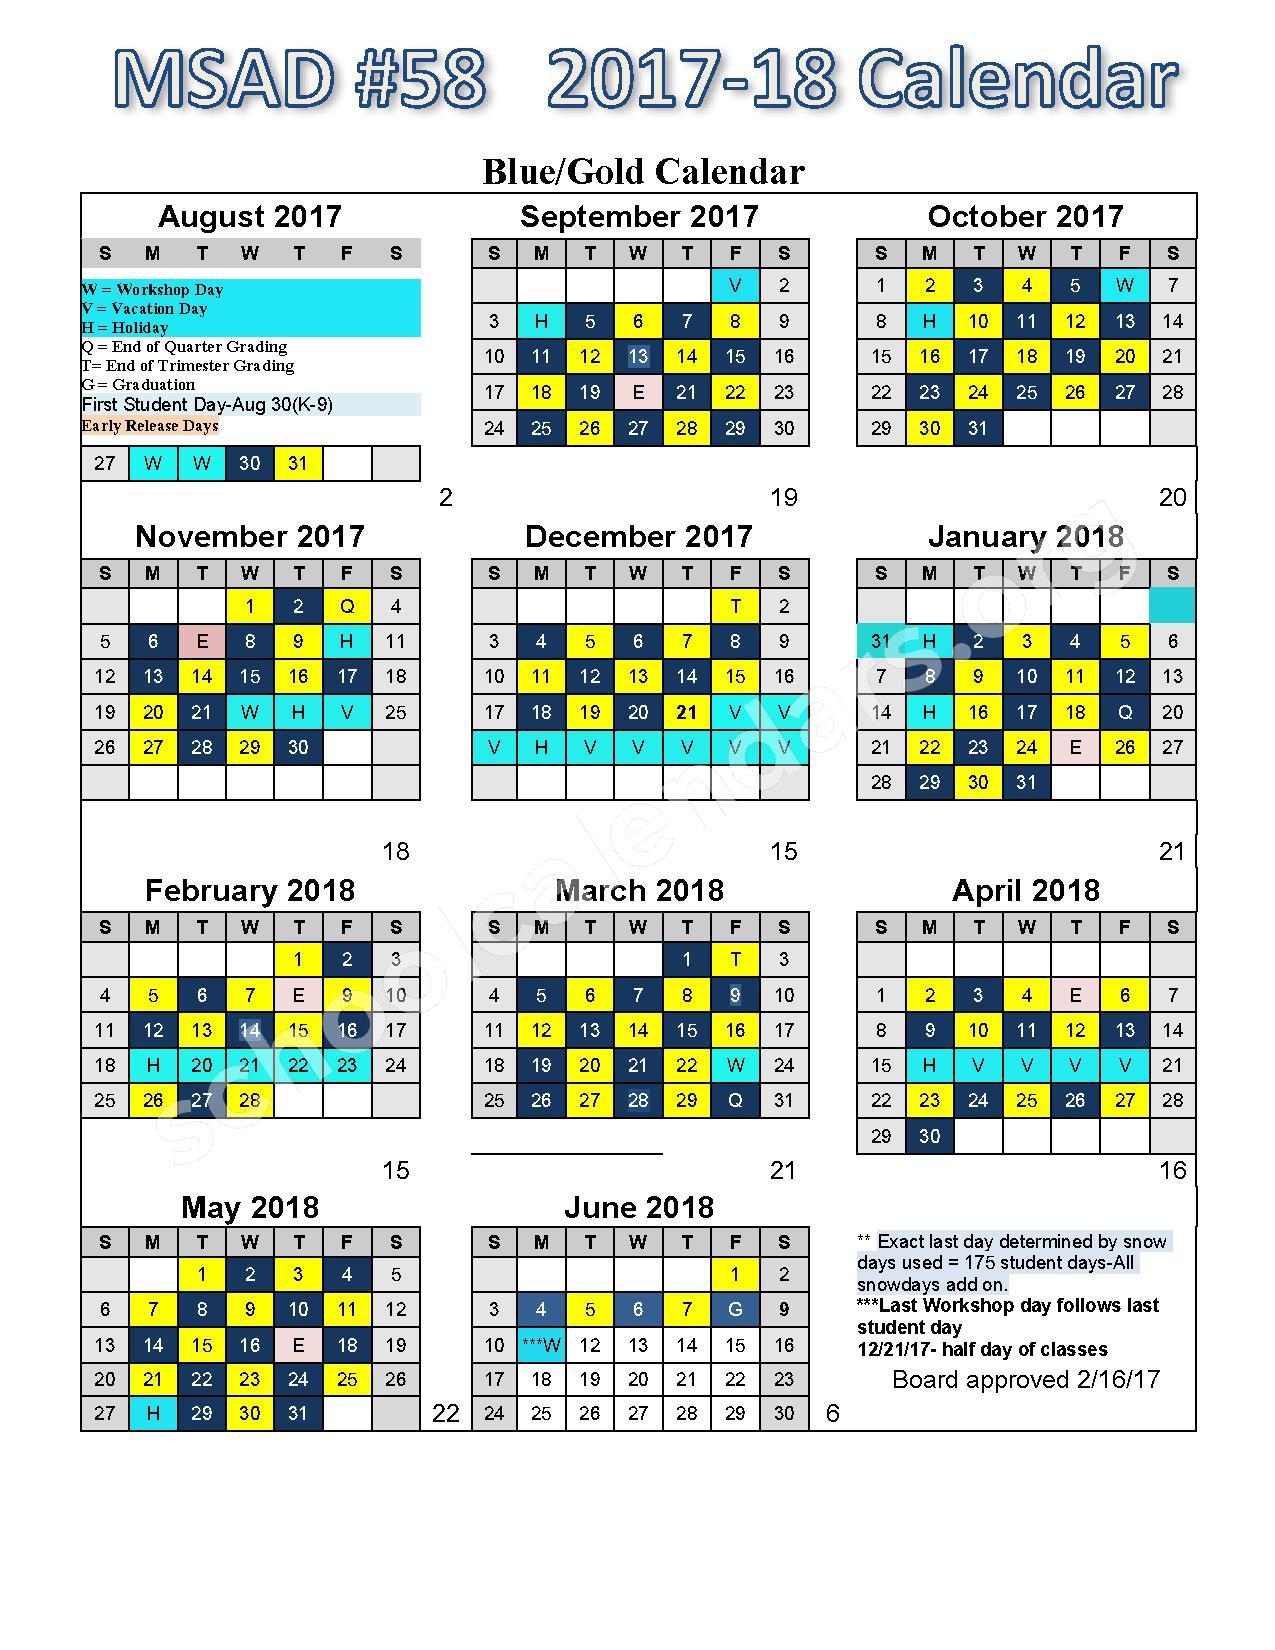 2017 - 2018 School Calendar – RSU 58/MSAD 58 - Kingfield, Avon, Strong – page 1